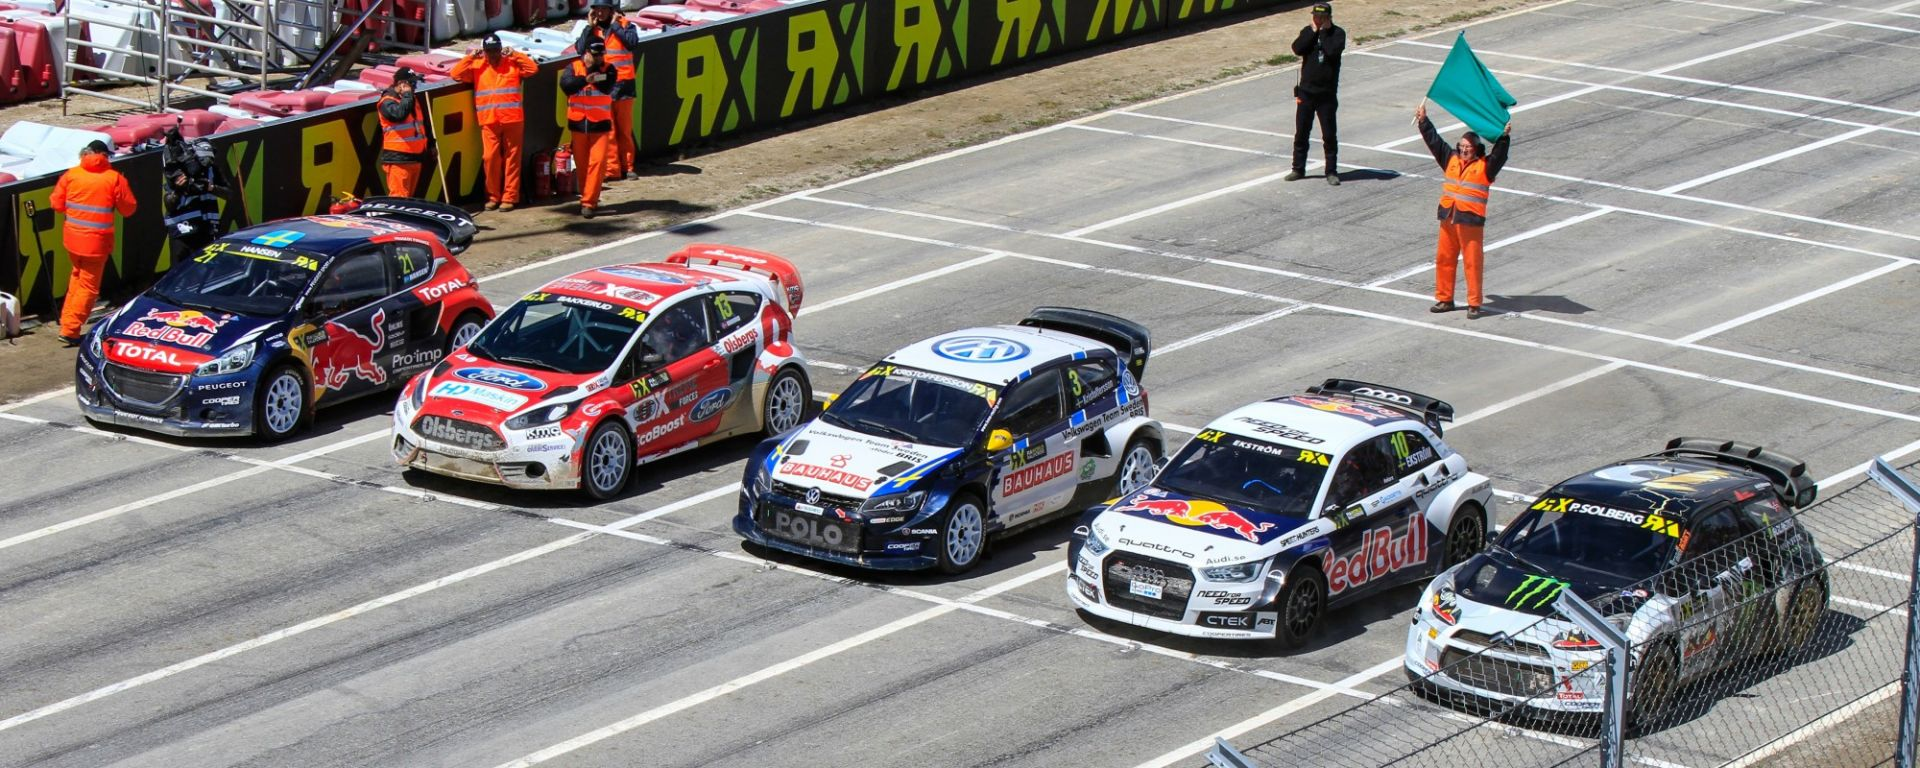 Rallycross 2018: GP Belgio Jules Tacheny - Info, risultati, programma,orari